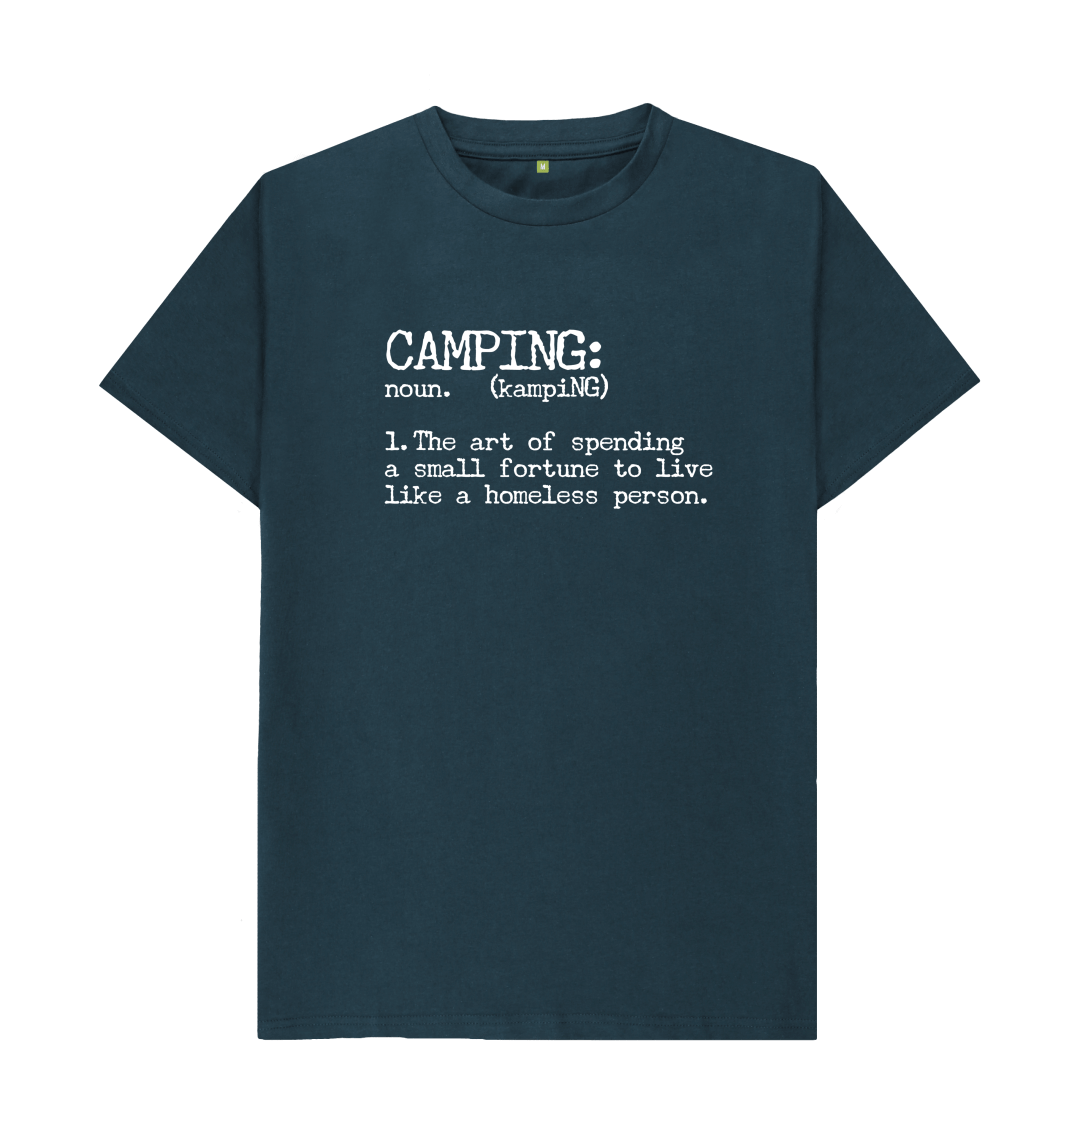 Camping Definition Funny Mens T Shirt Top - Organic Cotton, Vegan denim blue